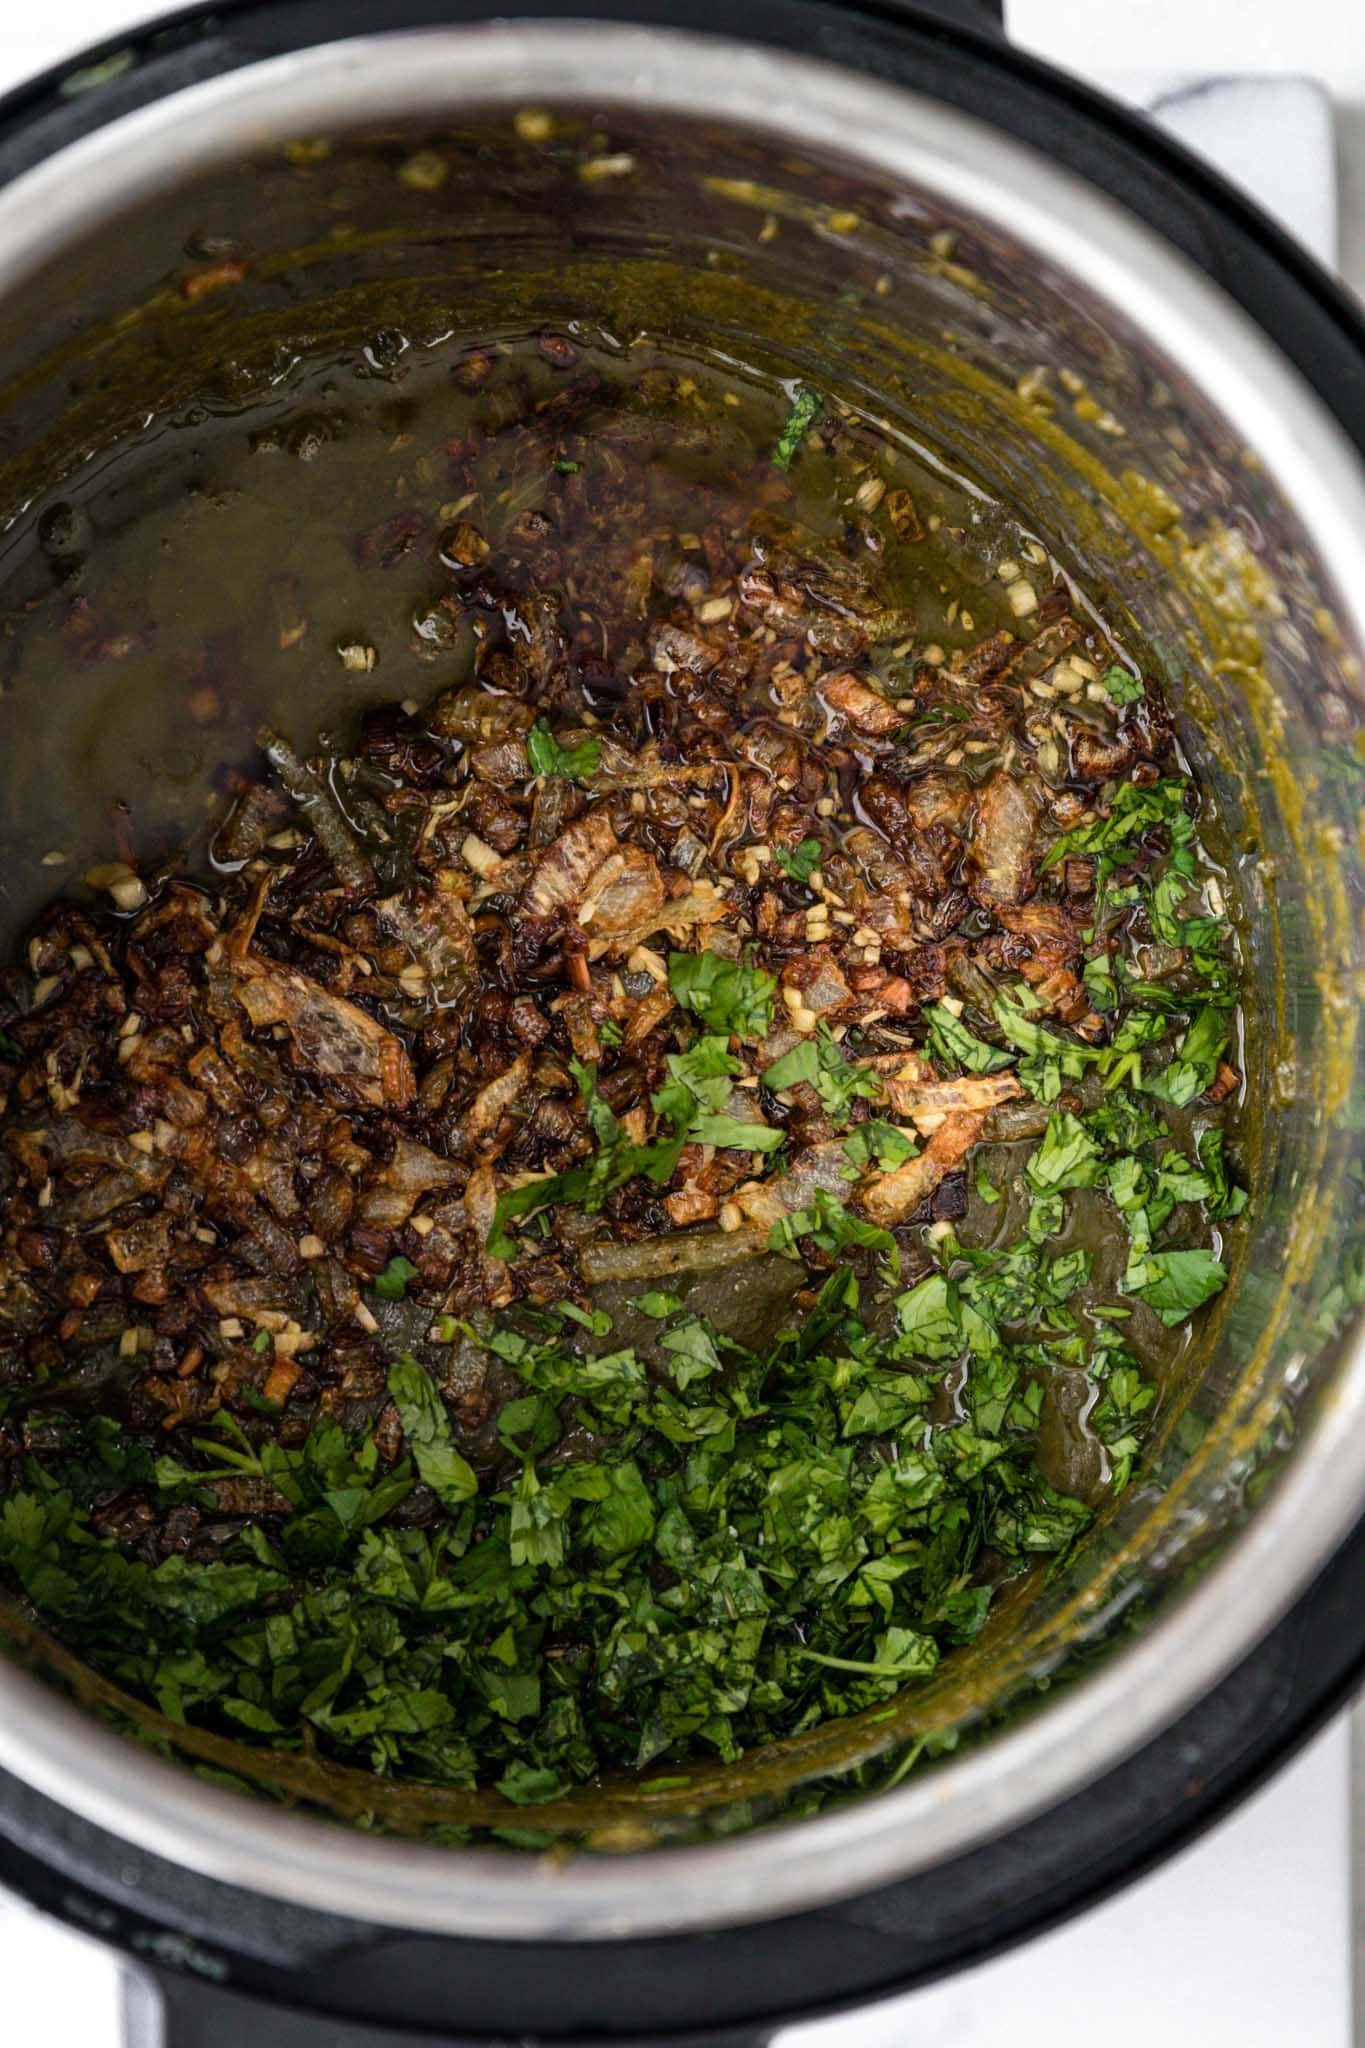 Tadka added to instant pot Sarson Ka Saag along with chopped cilantro